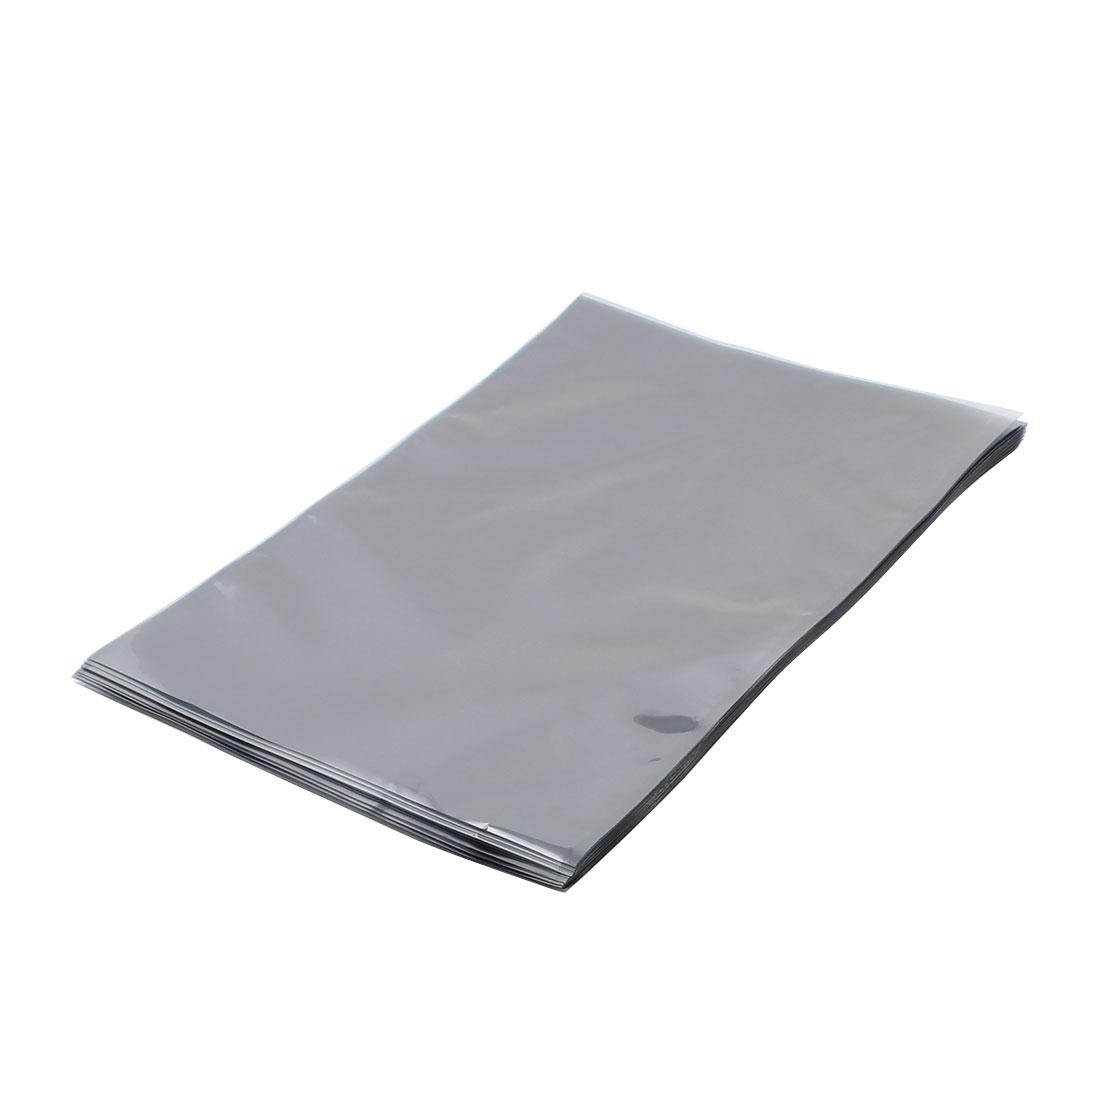 50 Pcs 270mm x 400mm Silver Tone Flat Open Top Anti Static Bag For Electronics